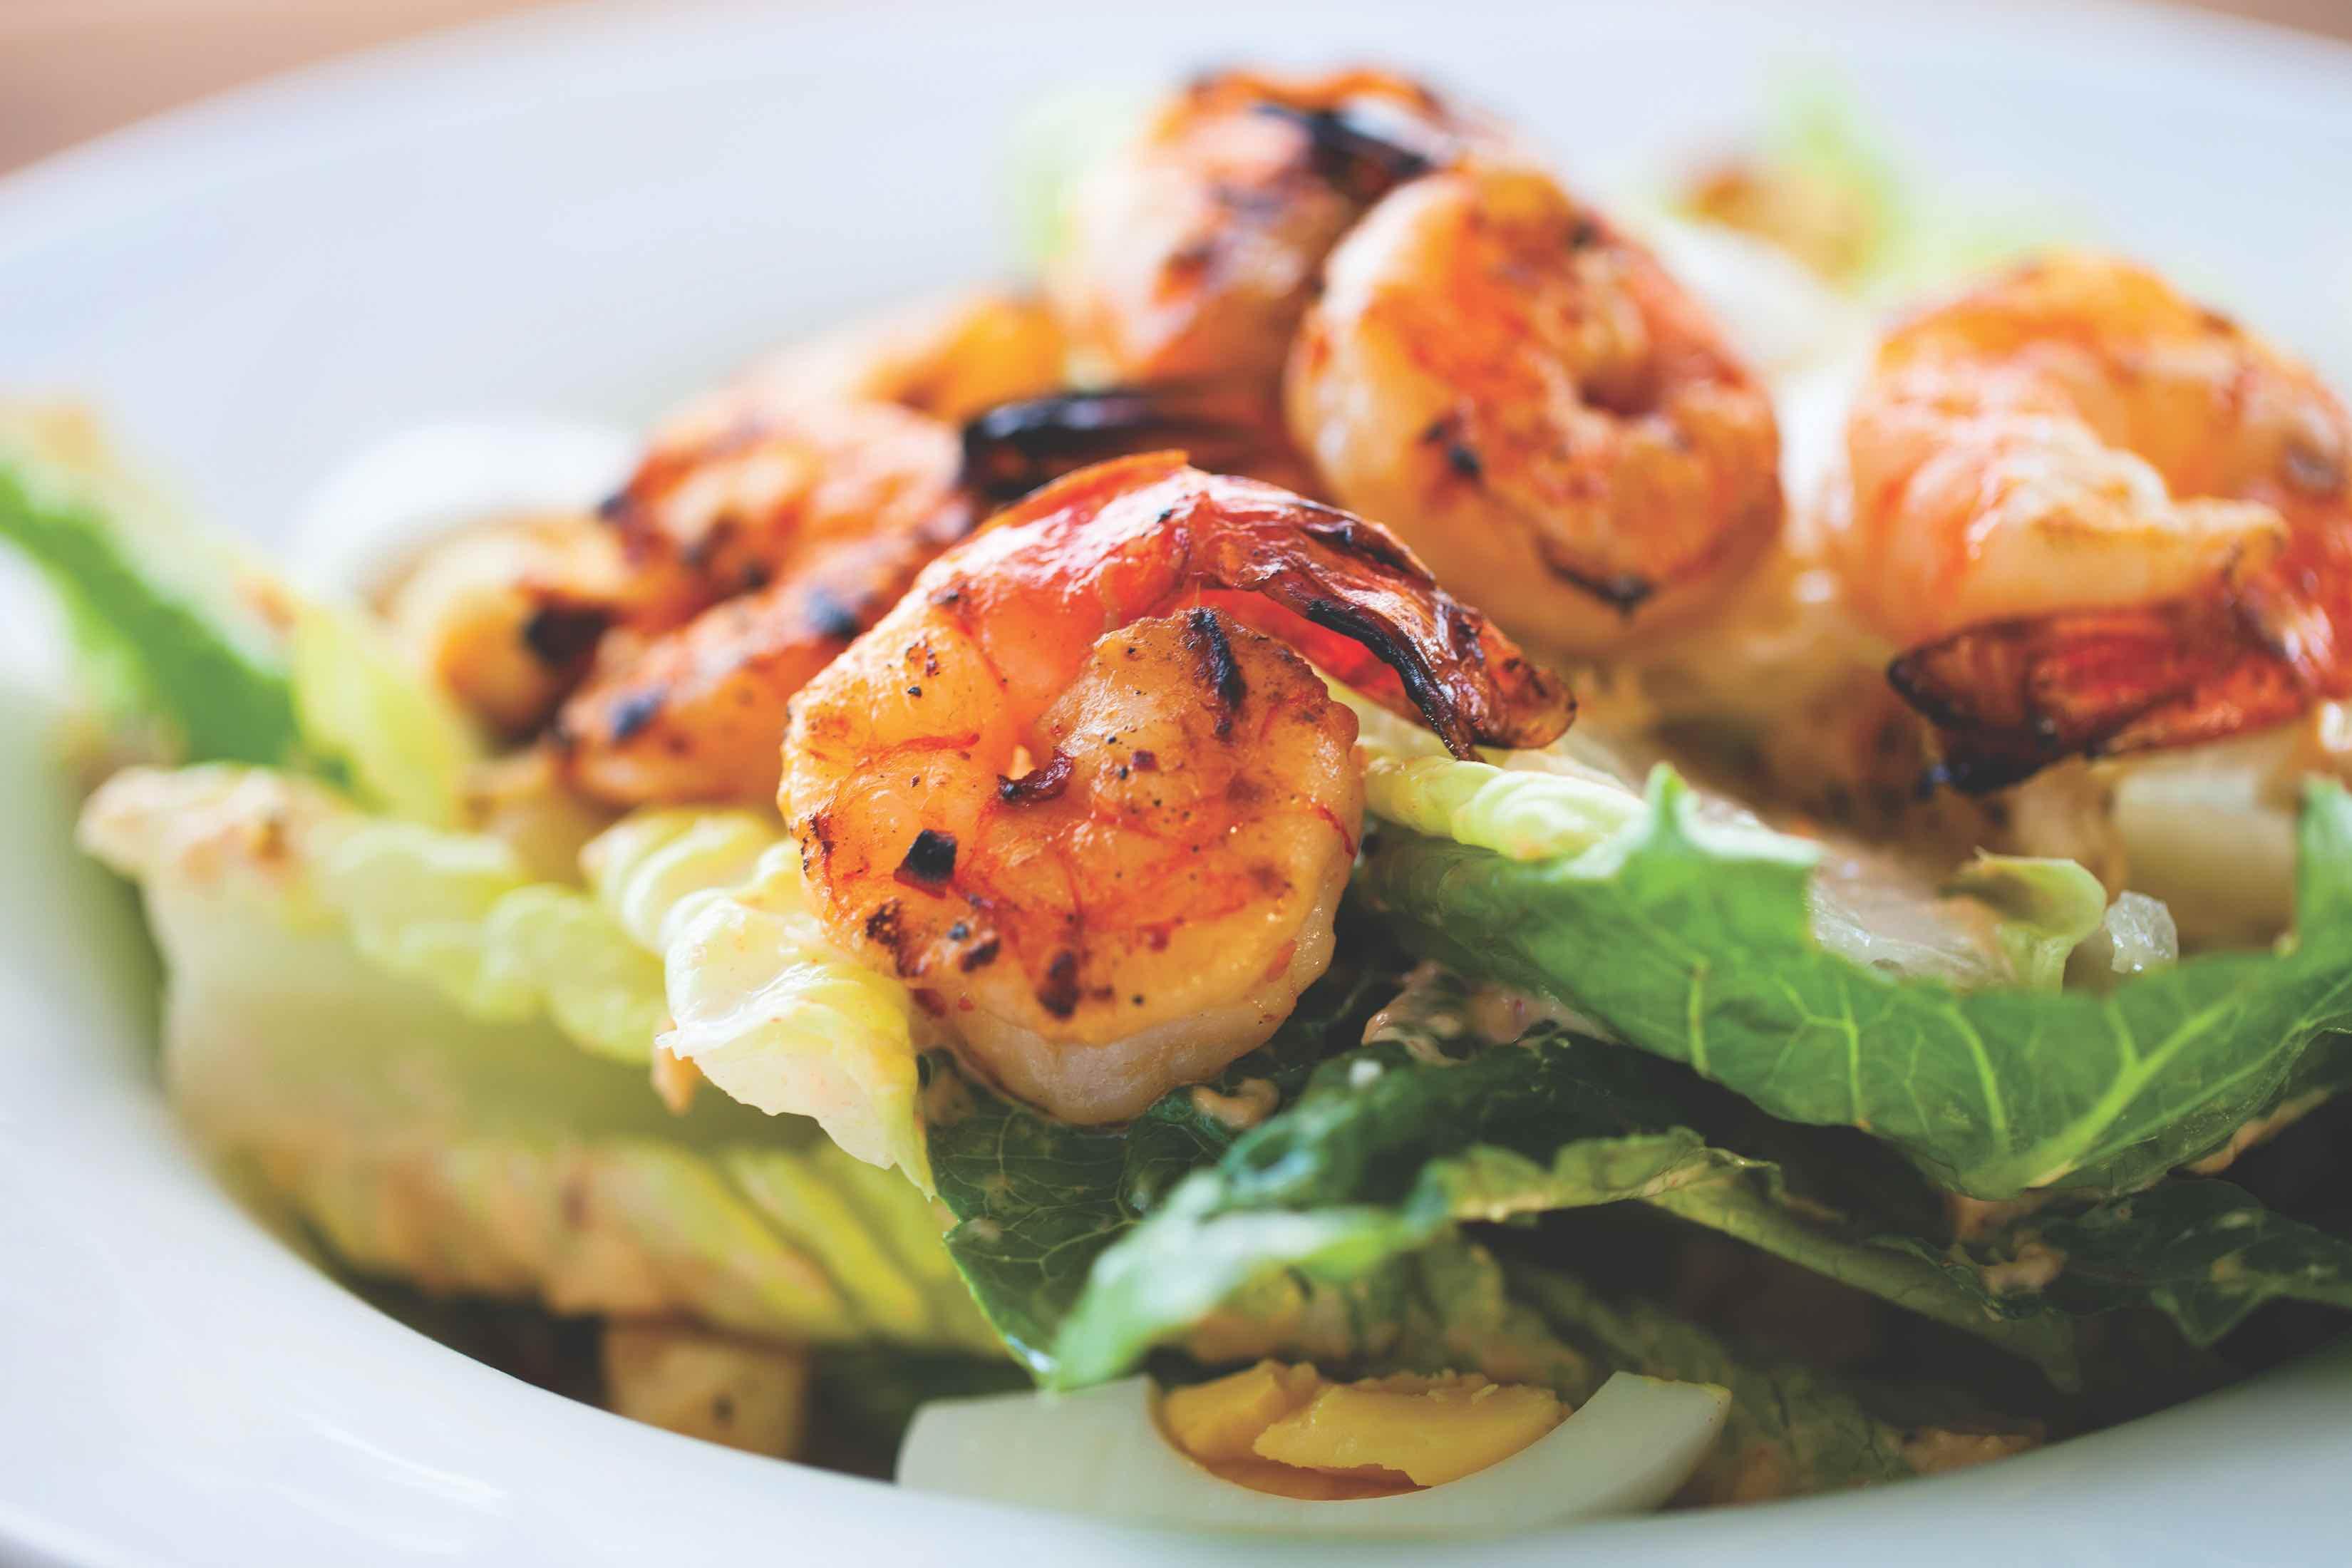 Shrimp salad